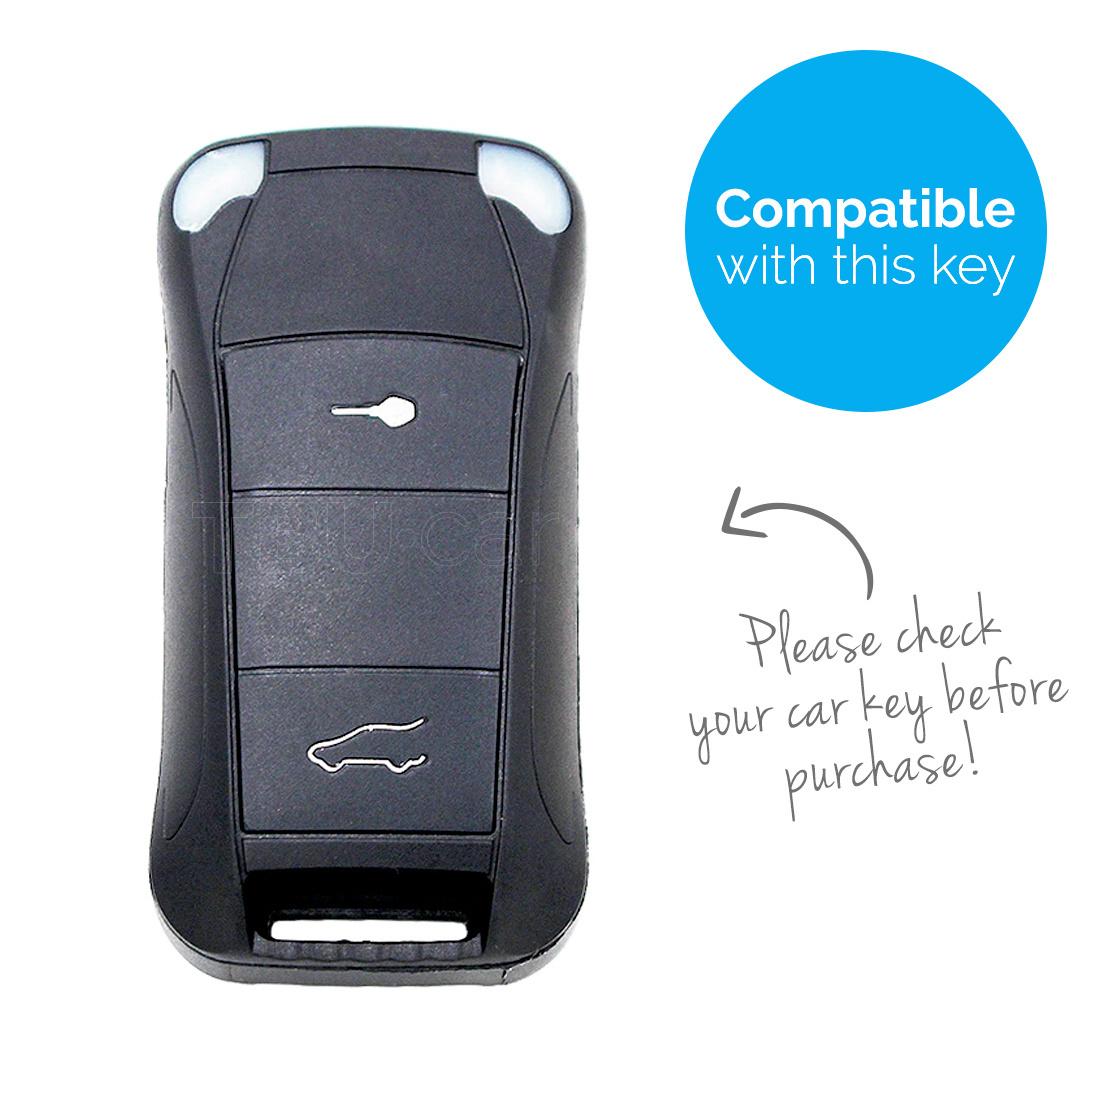 TBU car TBU car Autoschlüssel Hülle kompatibel mit Porsche 2 Tasten - Schutzhülle aus Silikon - Auto Schlüsselhülle Cover in Violett